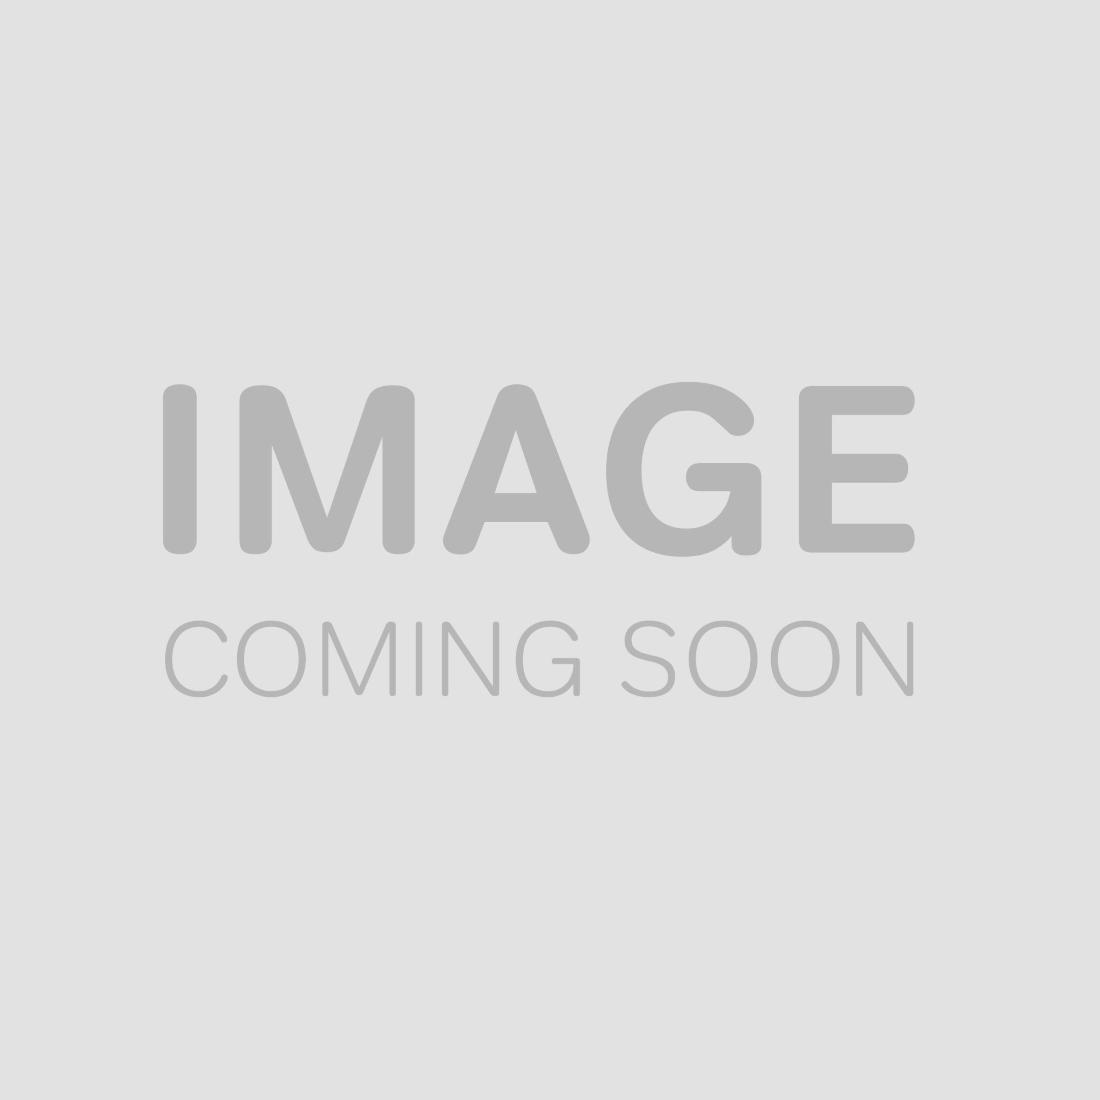 Safehip AirX Unisex - Small - 75-95cm hip